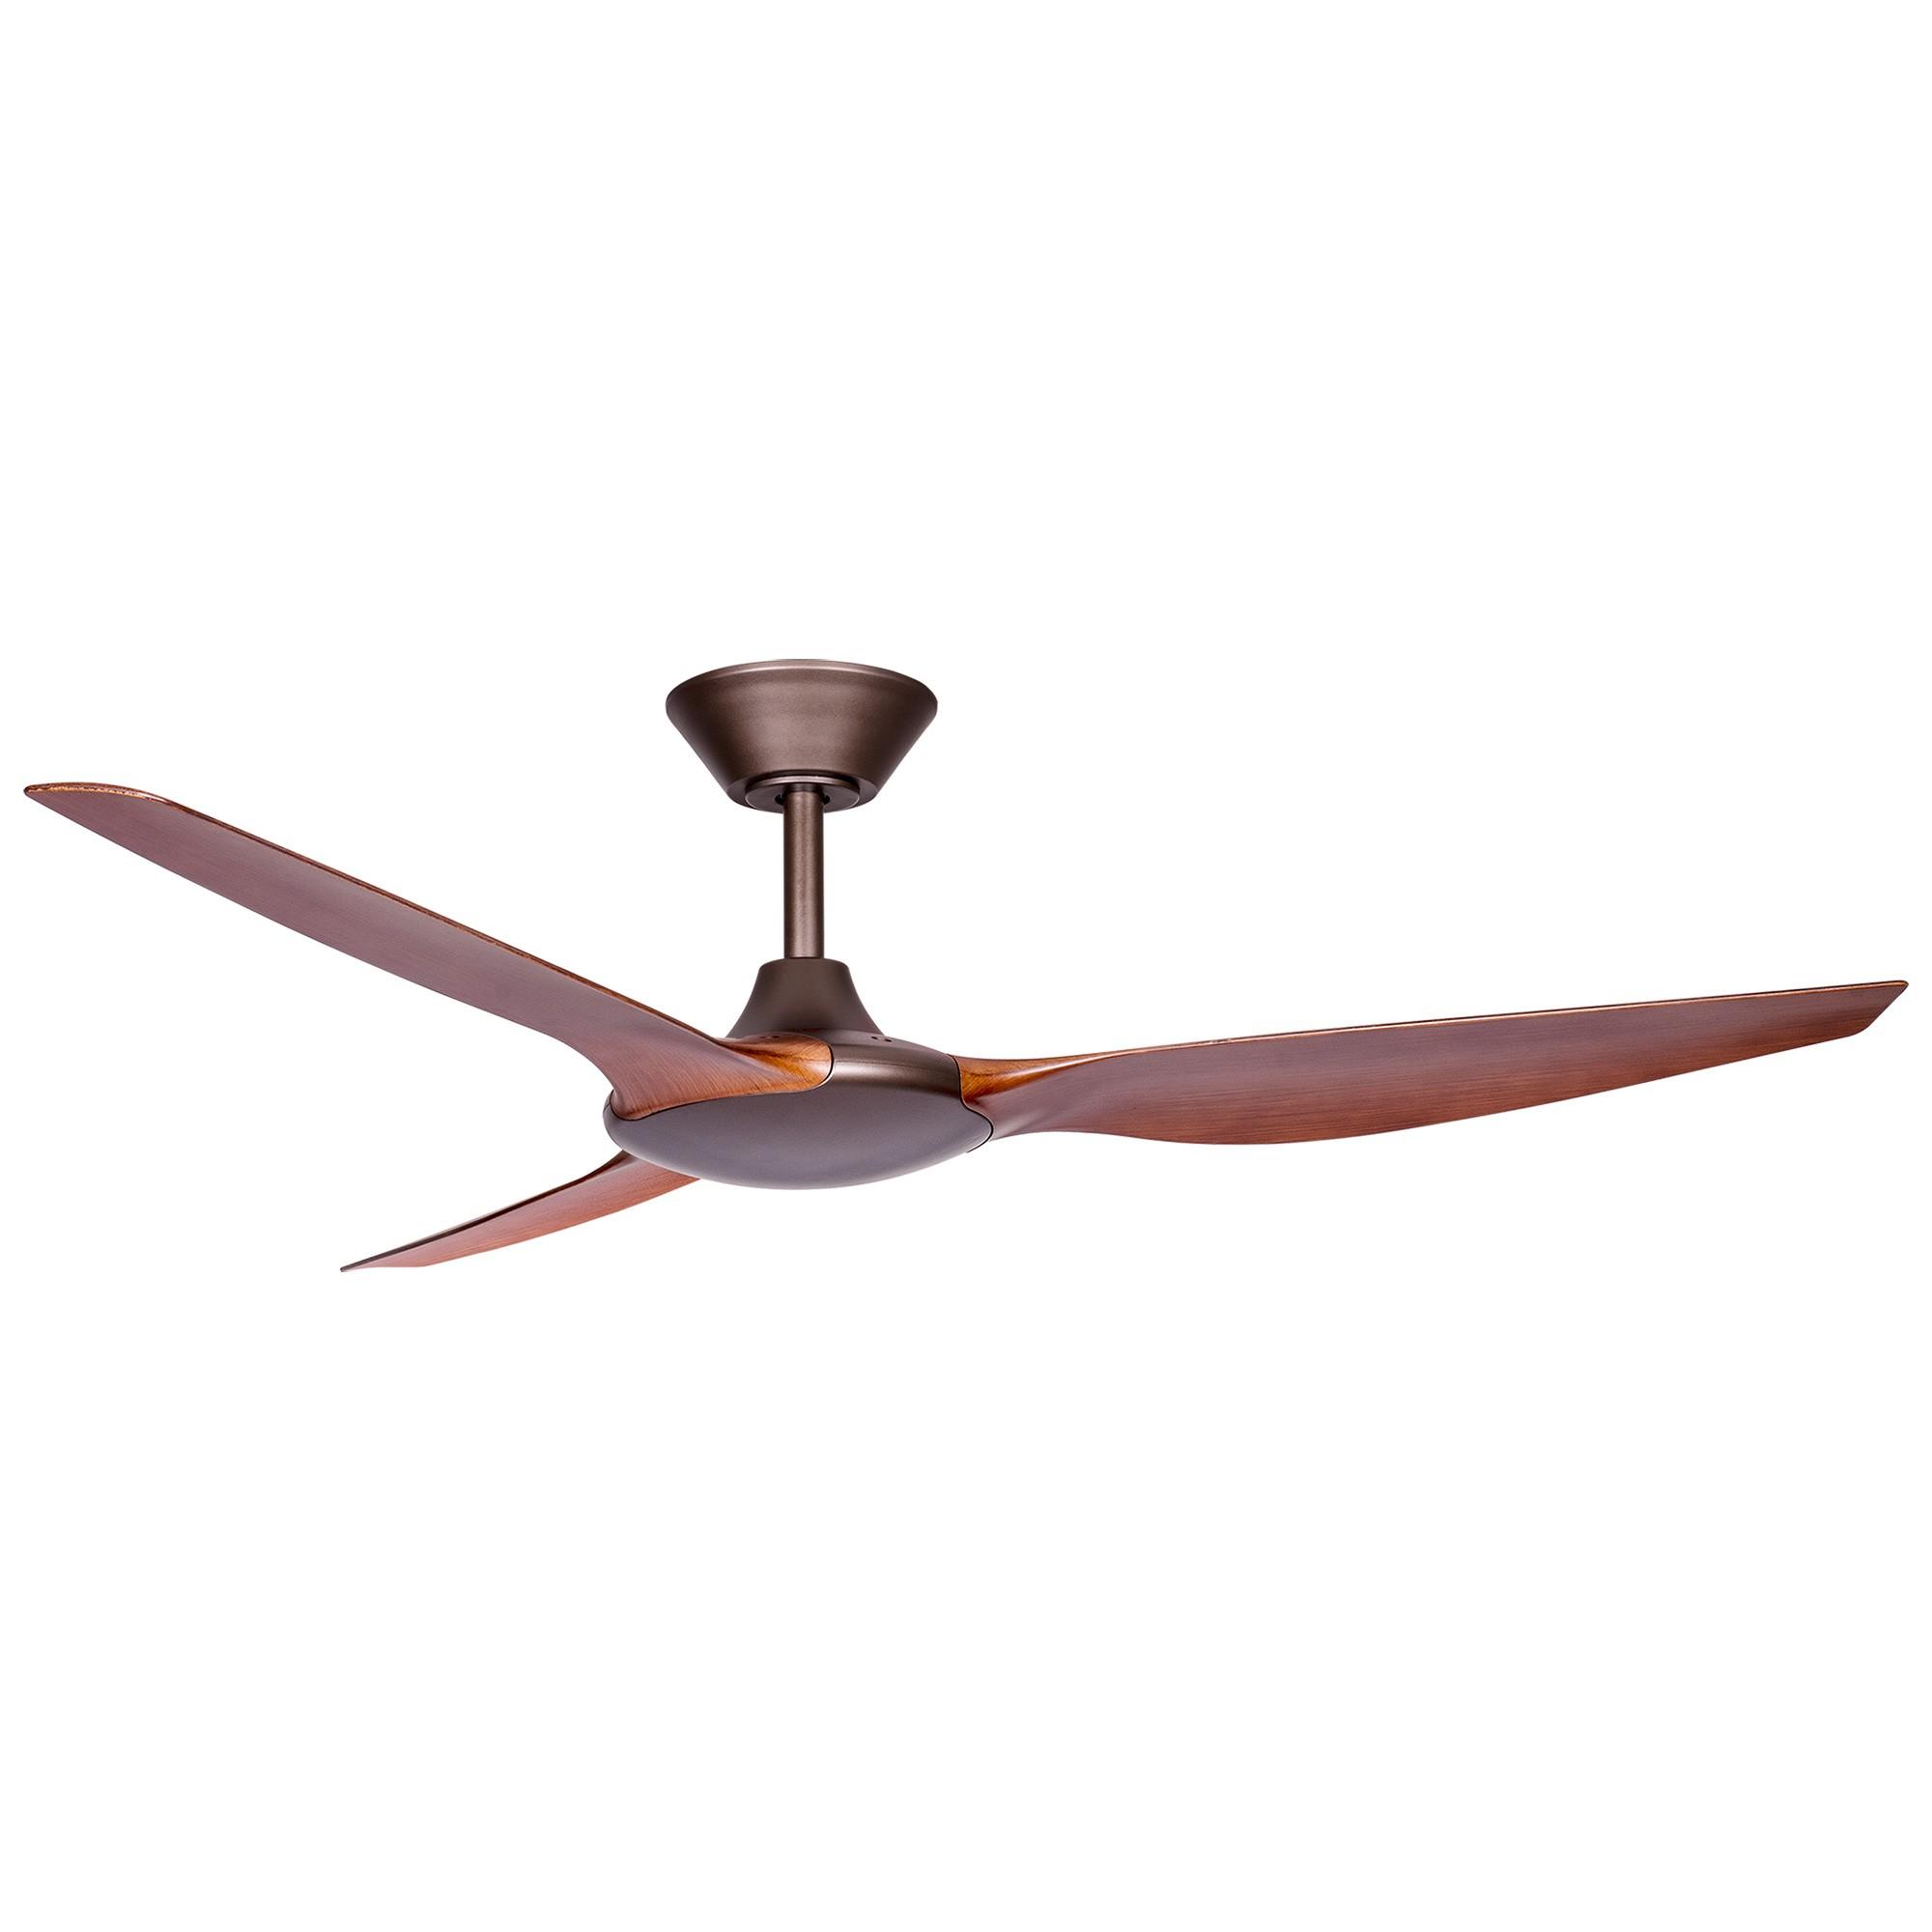 Threesixty Delta Commercial Grade DC Ceiling Fan, 142cm/56